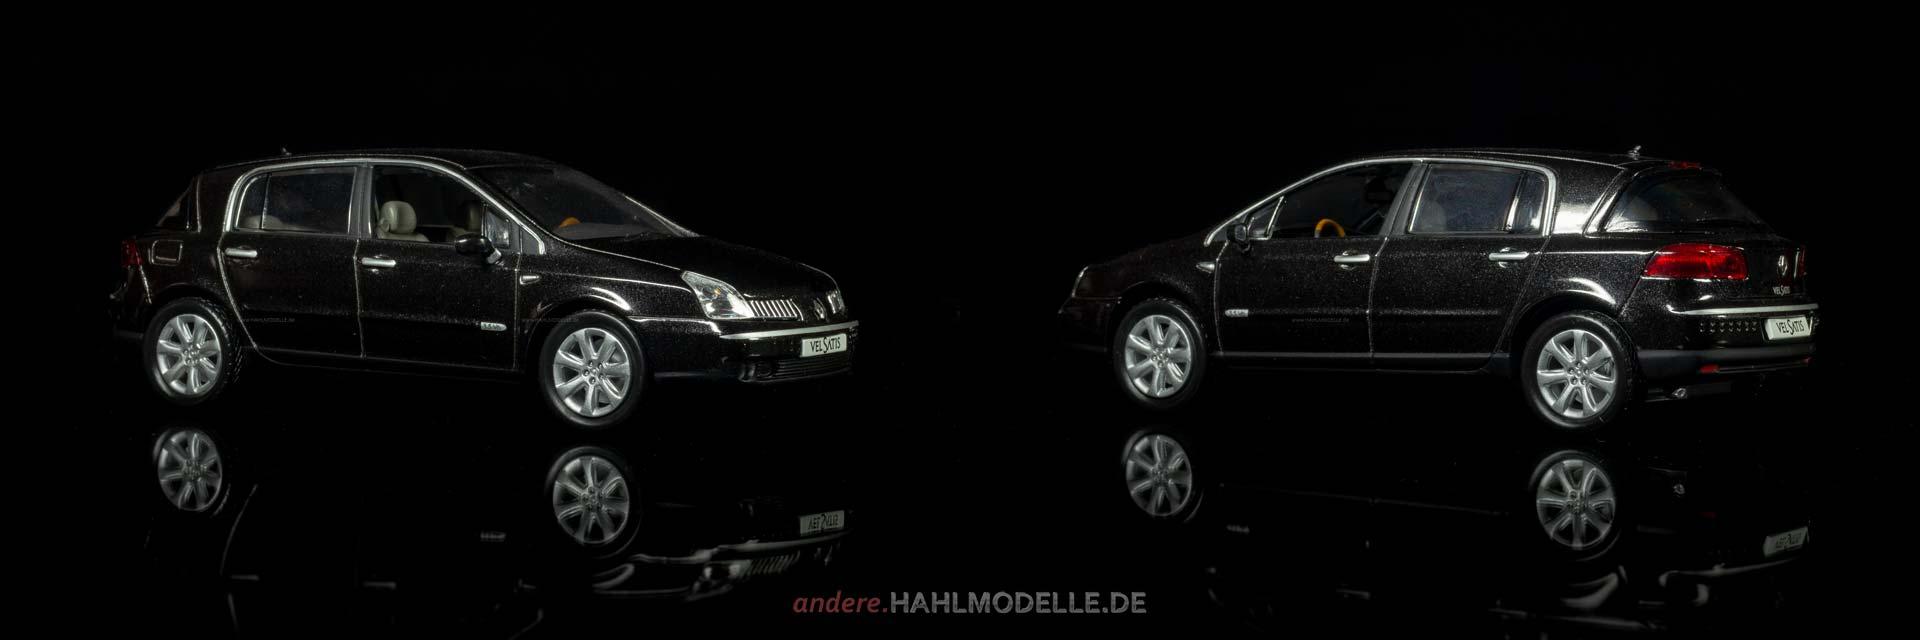 Renault VelSatis 3.5 V6 Initiale | Limousine | Norev | 1:43 | www.andere.hahlmodelle.de